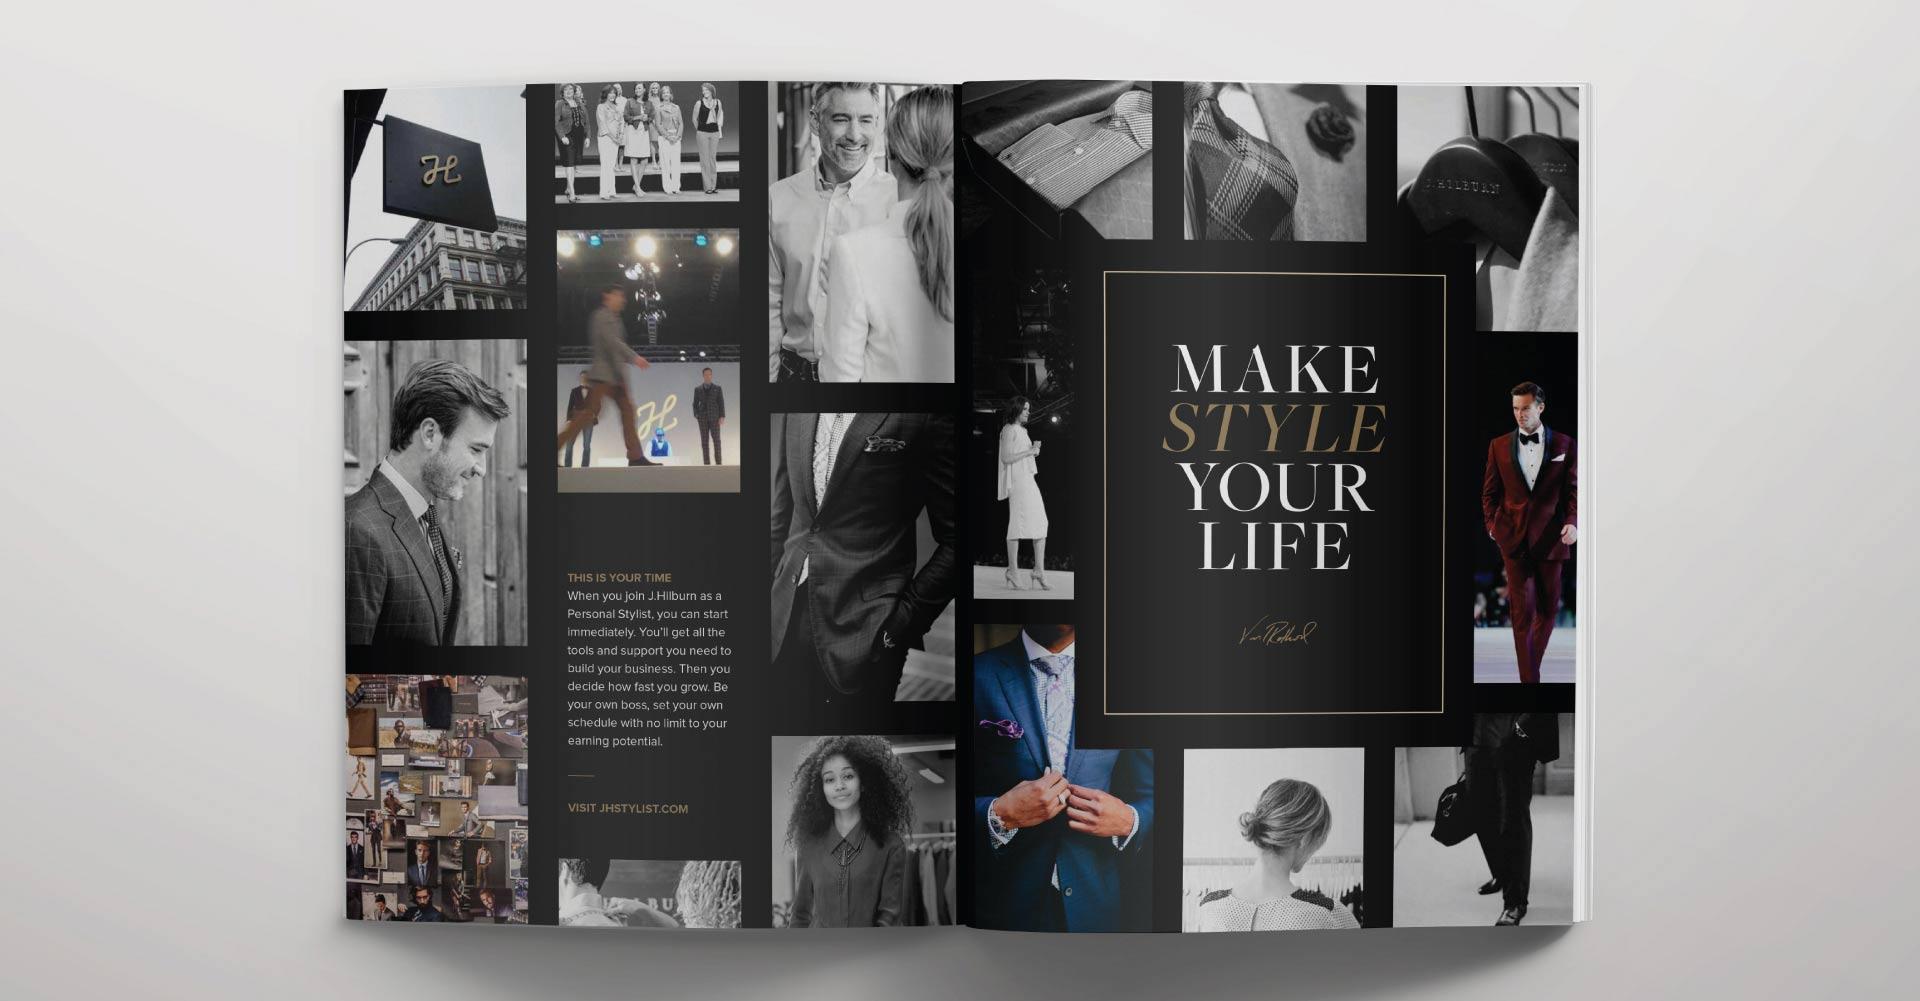 Creative_Retail_Packaging_Branding_Identity_Web_Design_JHilburn_9.jpg